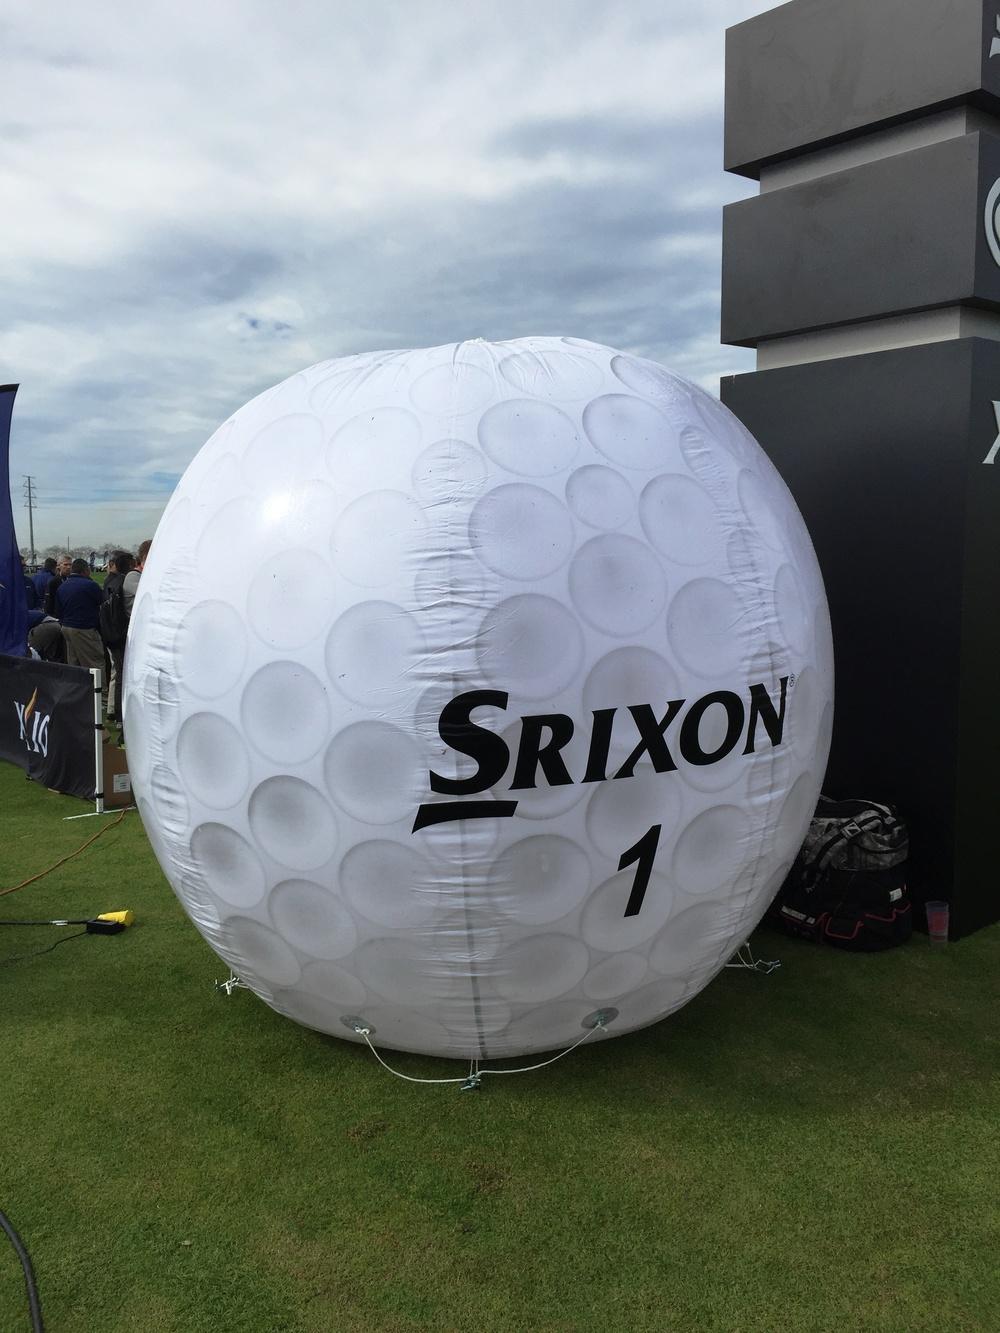 srixon inflatable.jpg